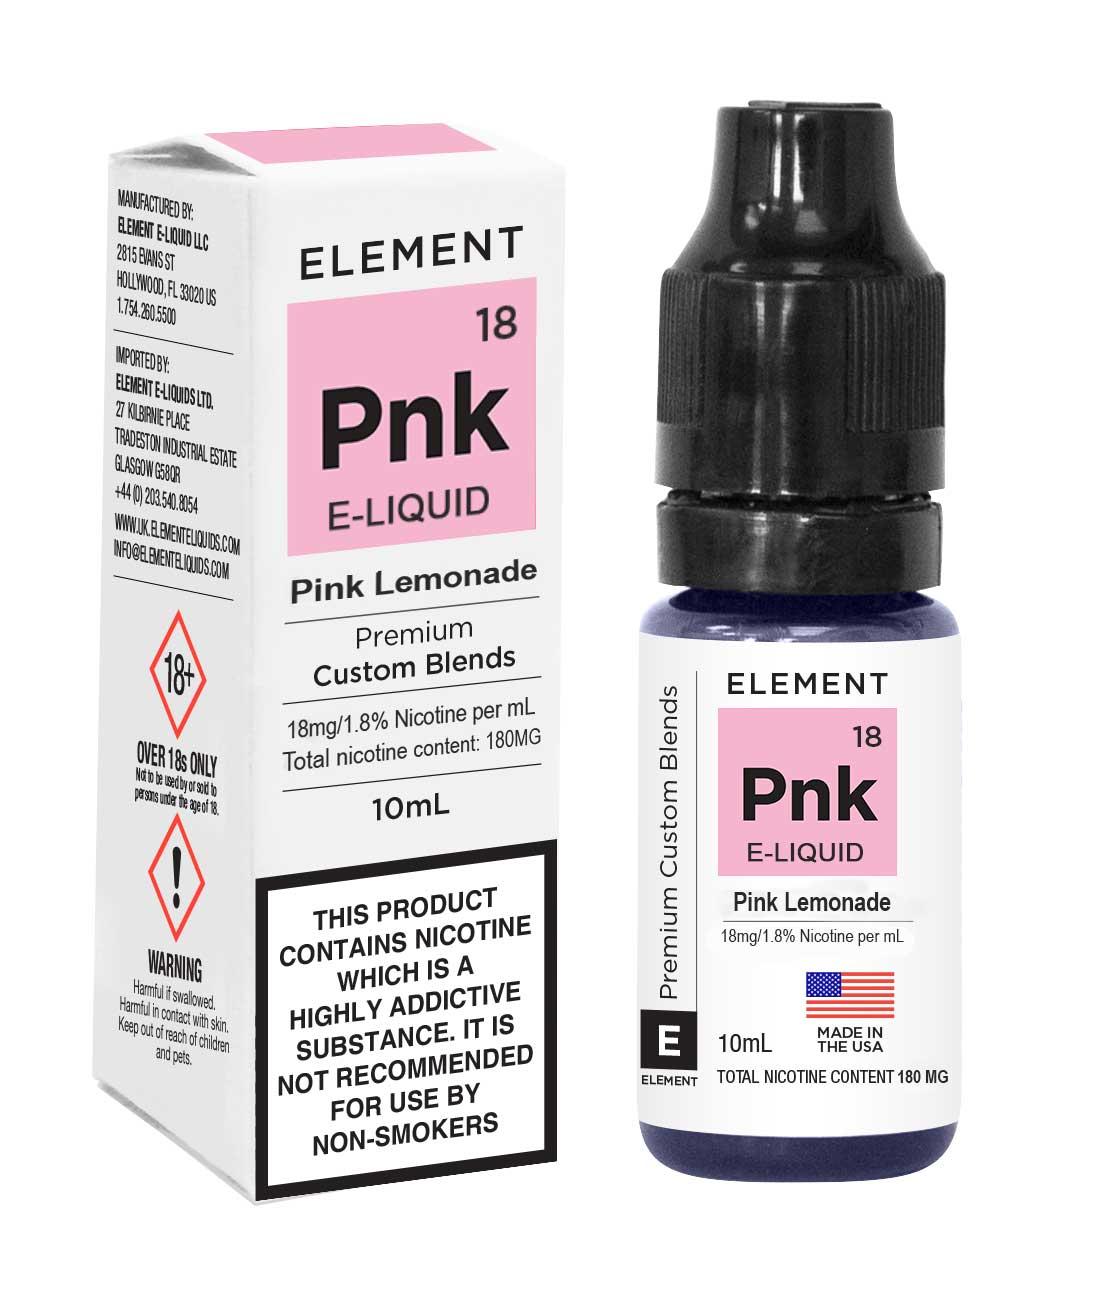 Compare prices for Element E-liquid Pink Lemonade 10ml - 18mg Nicotine